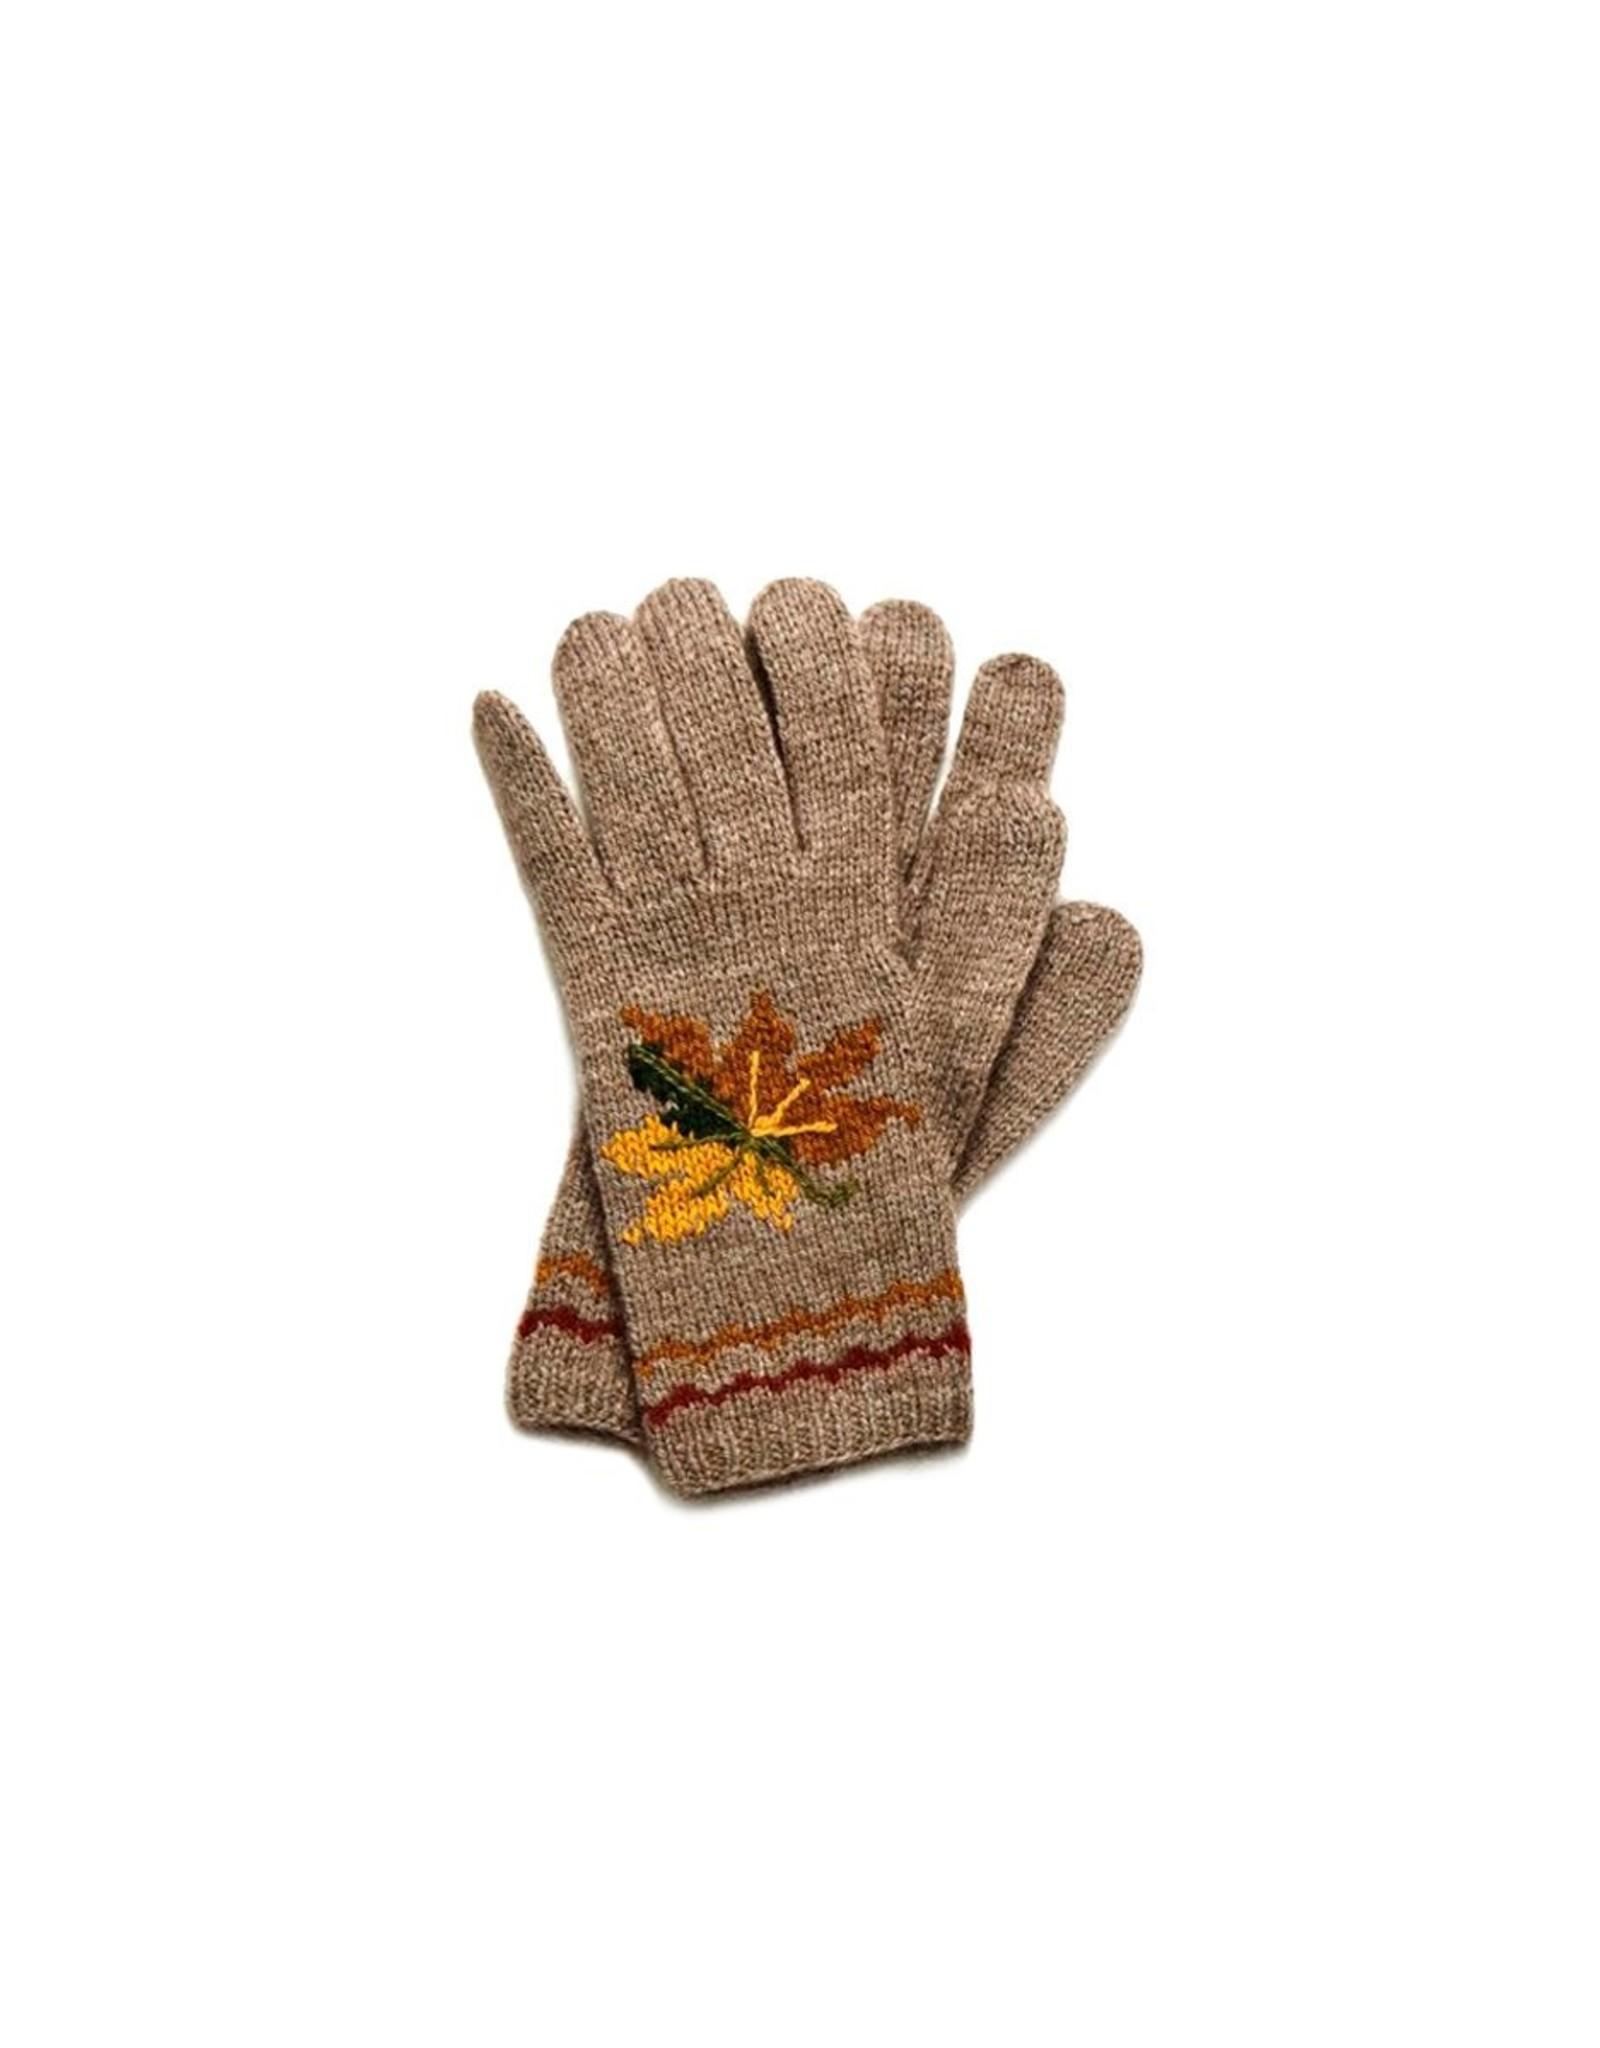 Wind Gloves - 45% Qiviuk 45% Merino 10% Silk